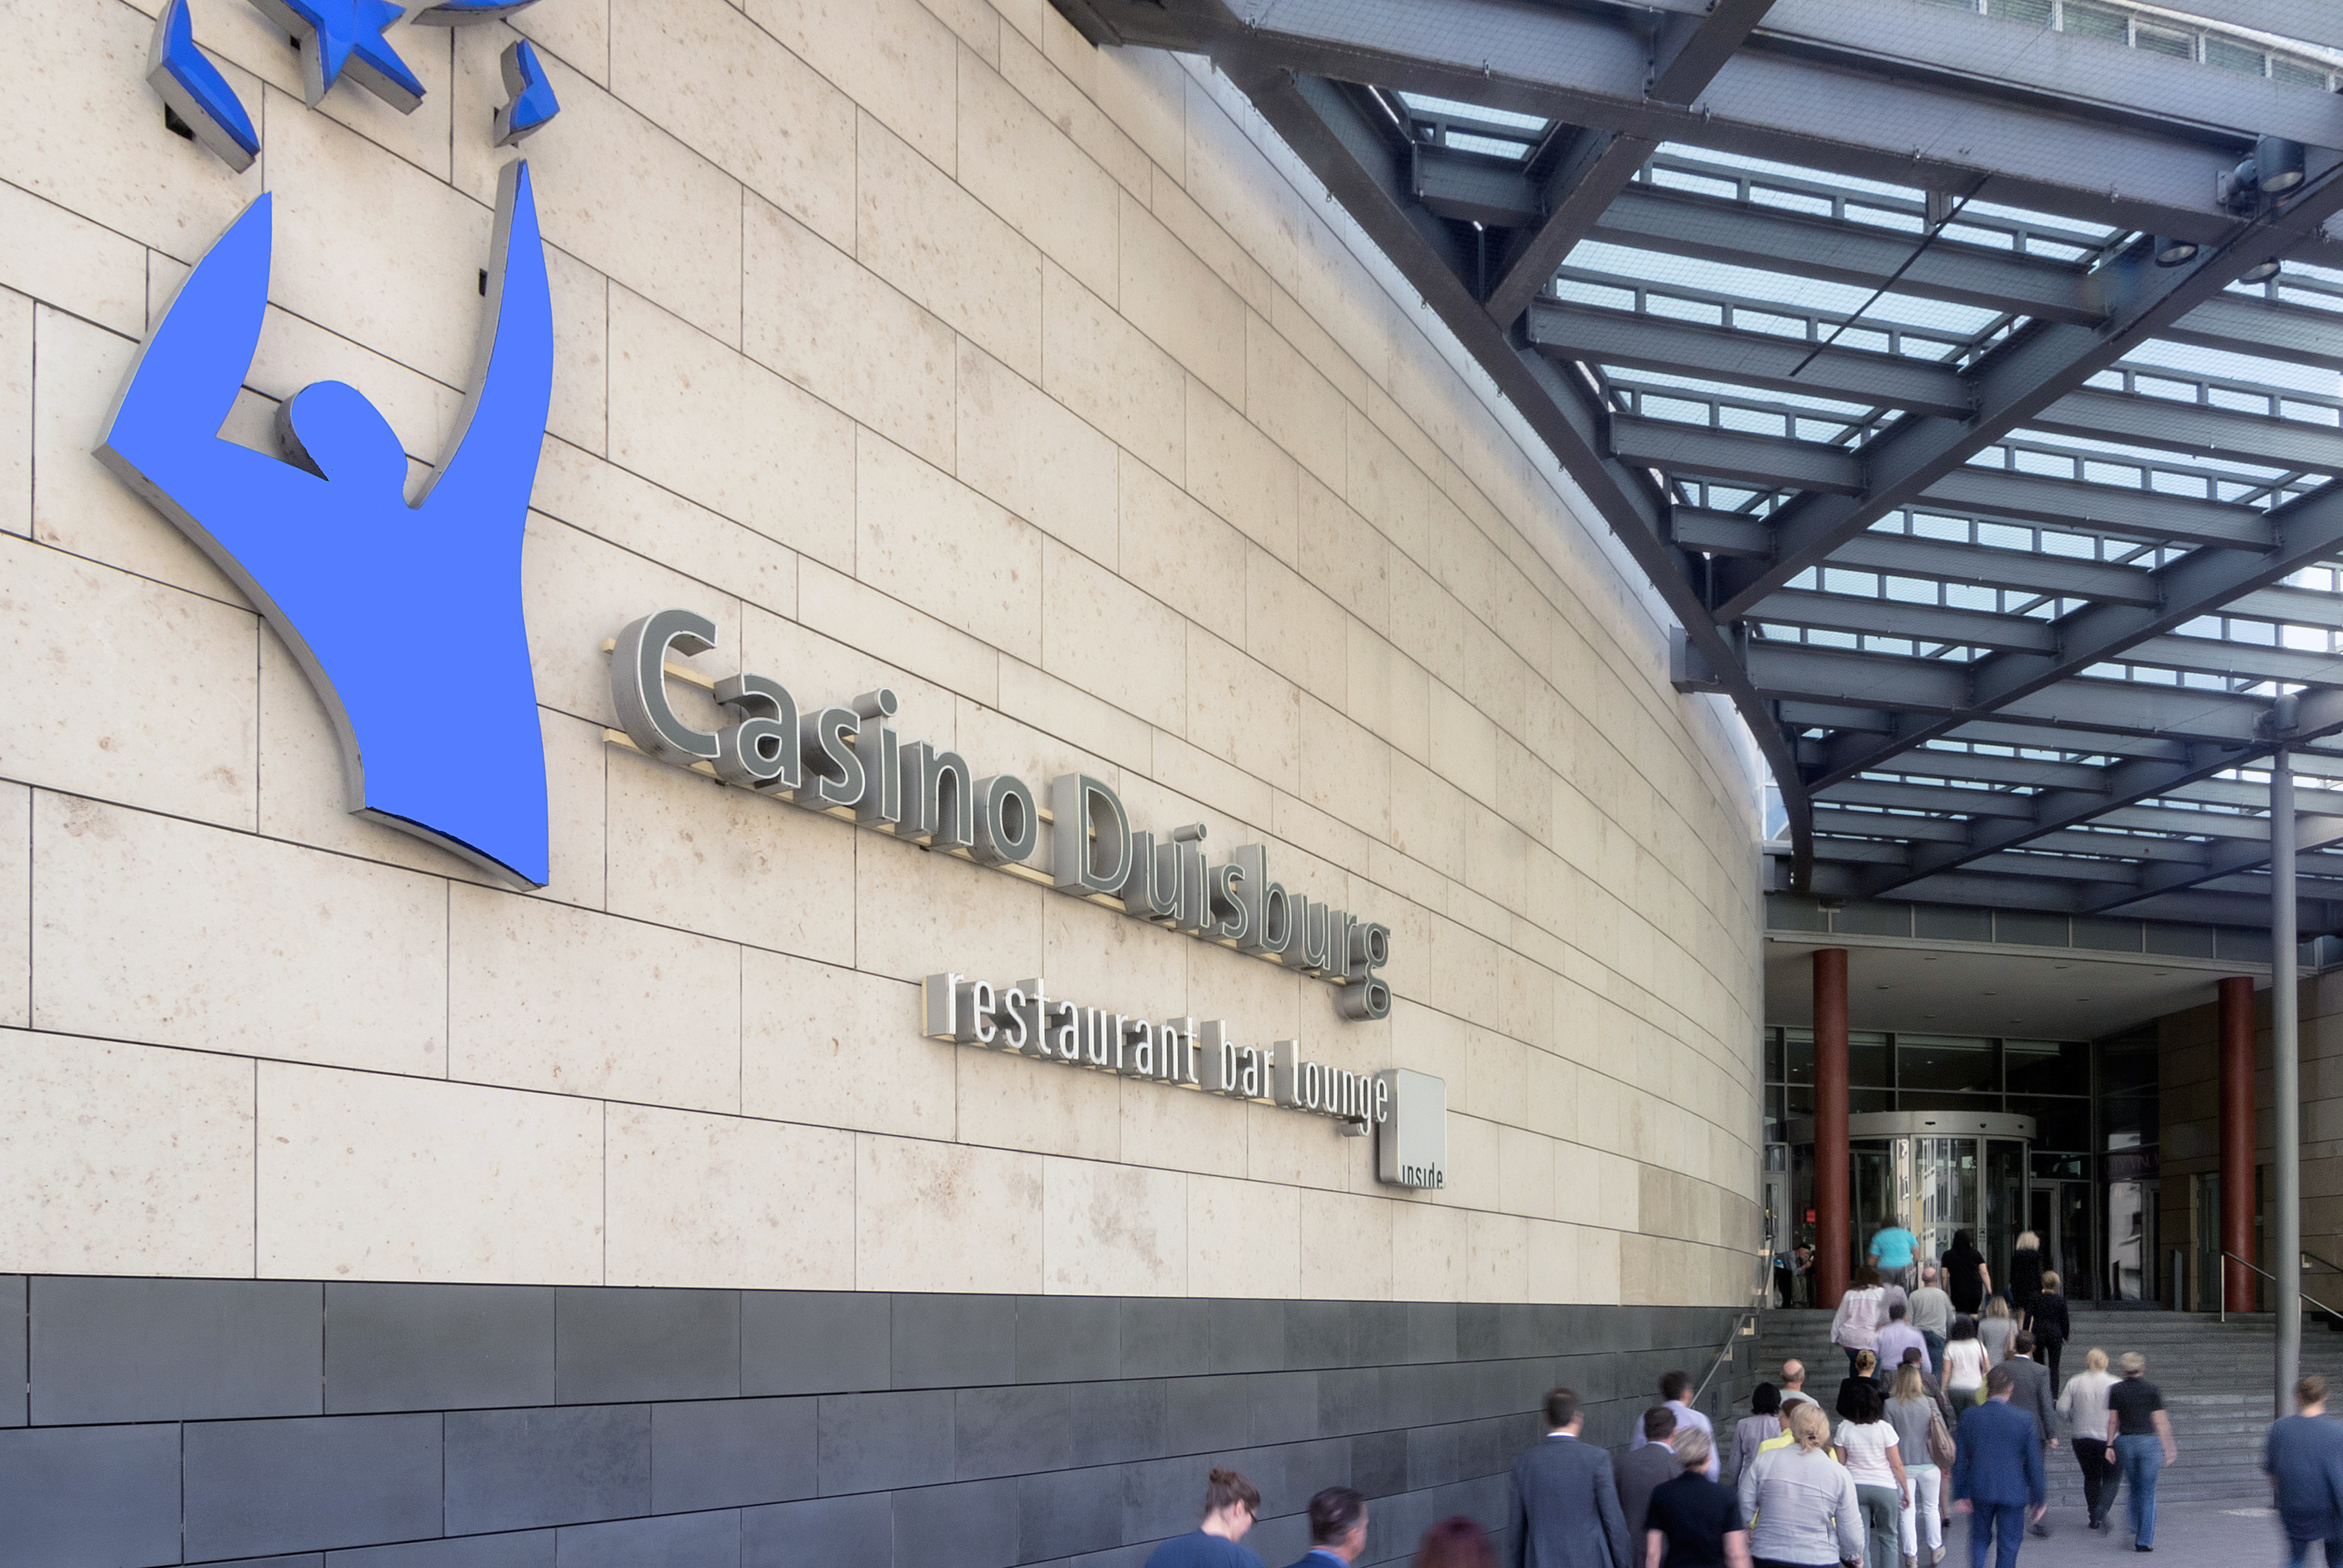 Casino duisburg poker einsatz